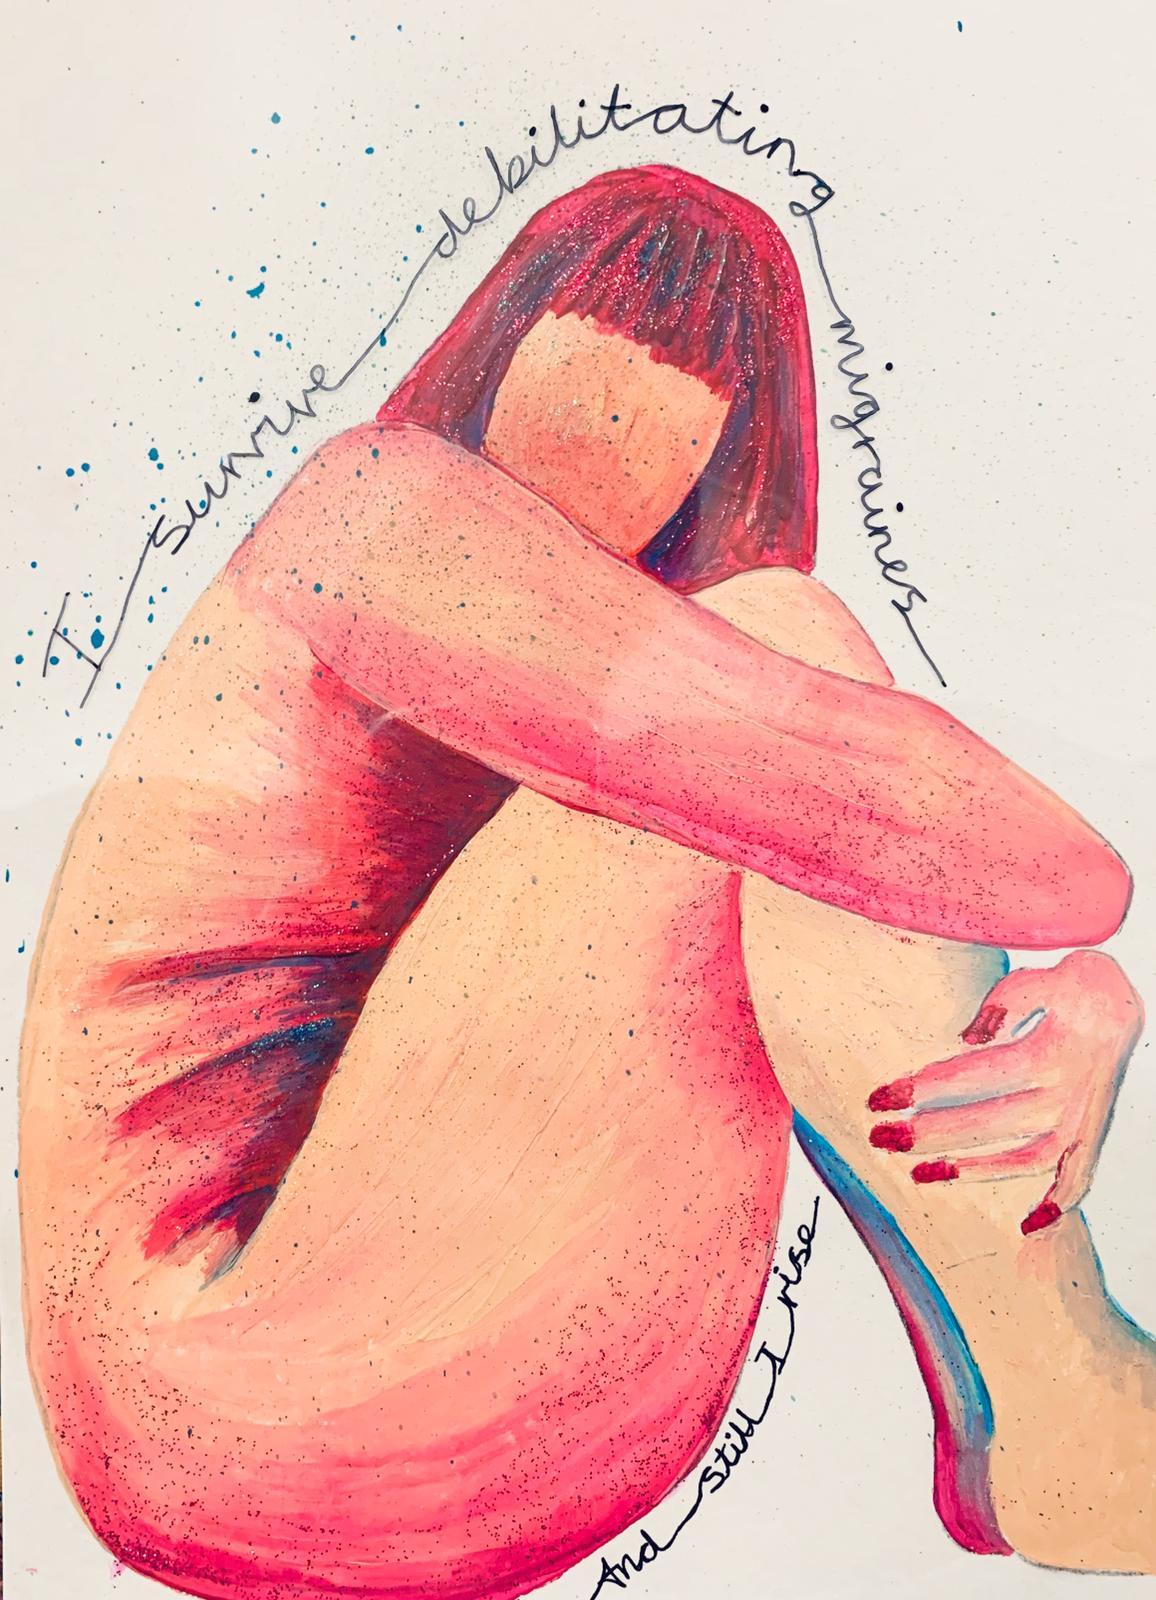 I survive debilitating migraines